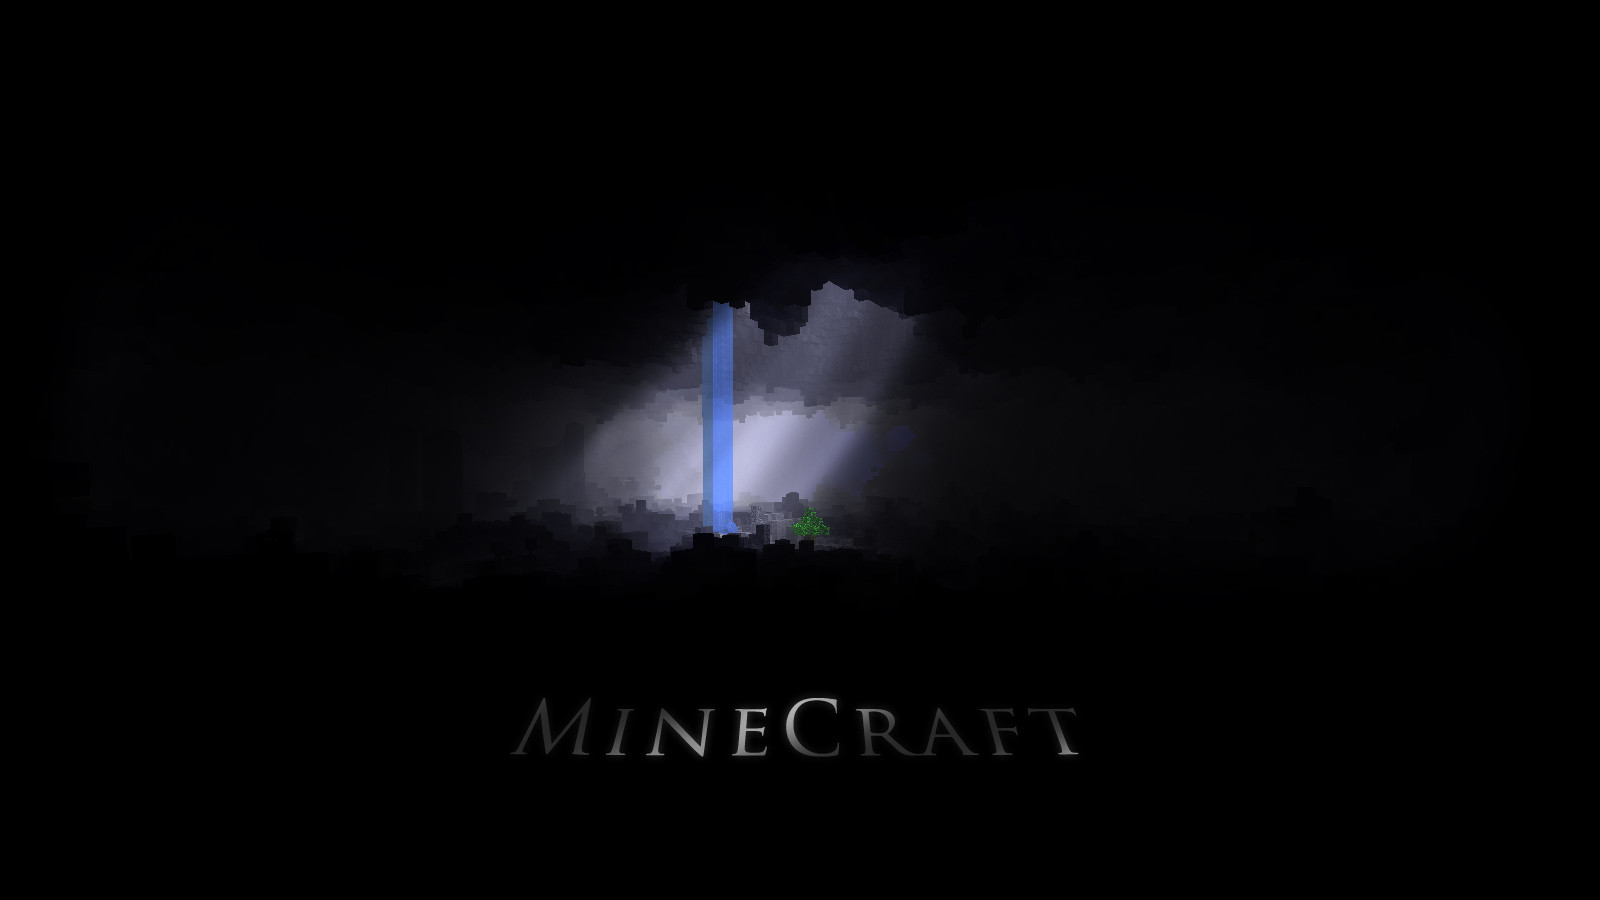 http://4.bp.blogspot.com/-ASqg7wesX40/TqsIQhNex9I/AAAAAAAAAfA/LlStHOJHSko/s1600/Minecraft+Wallpaper+HD+1600x900.jpg